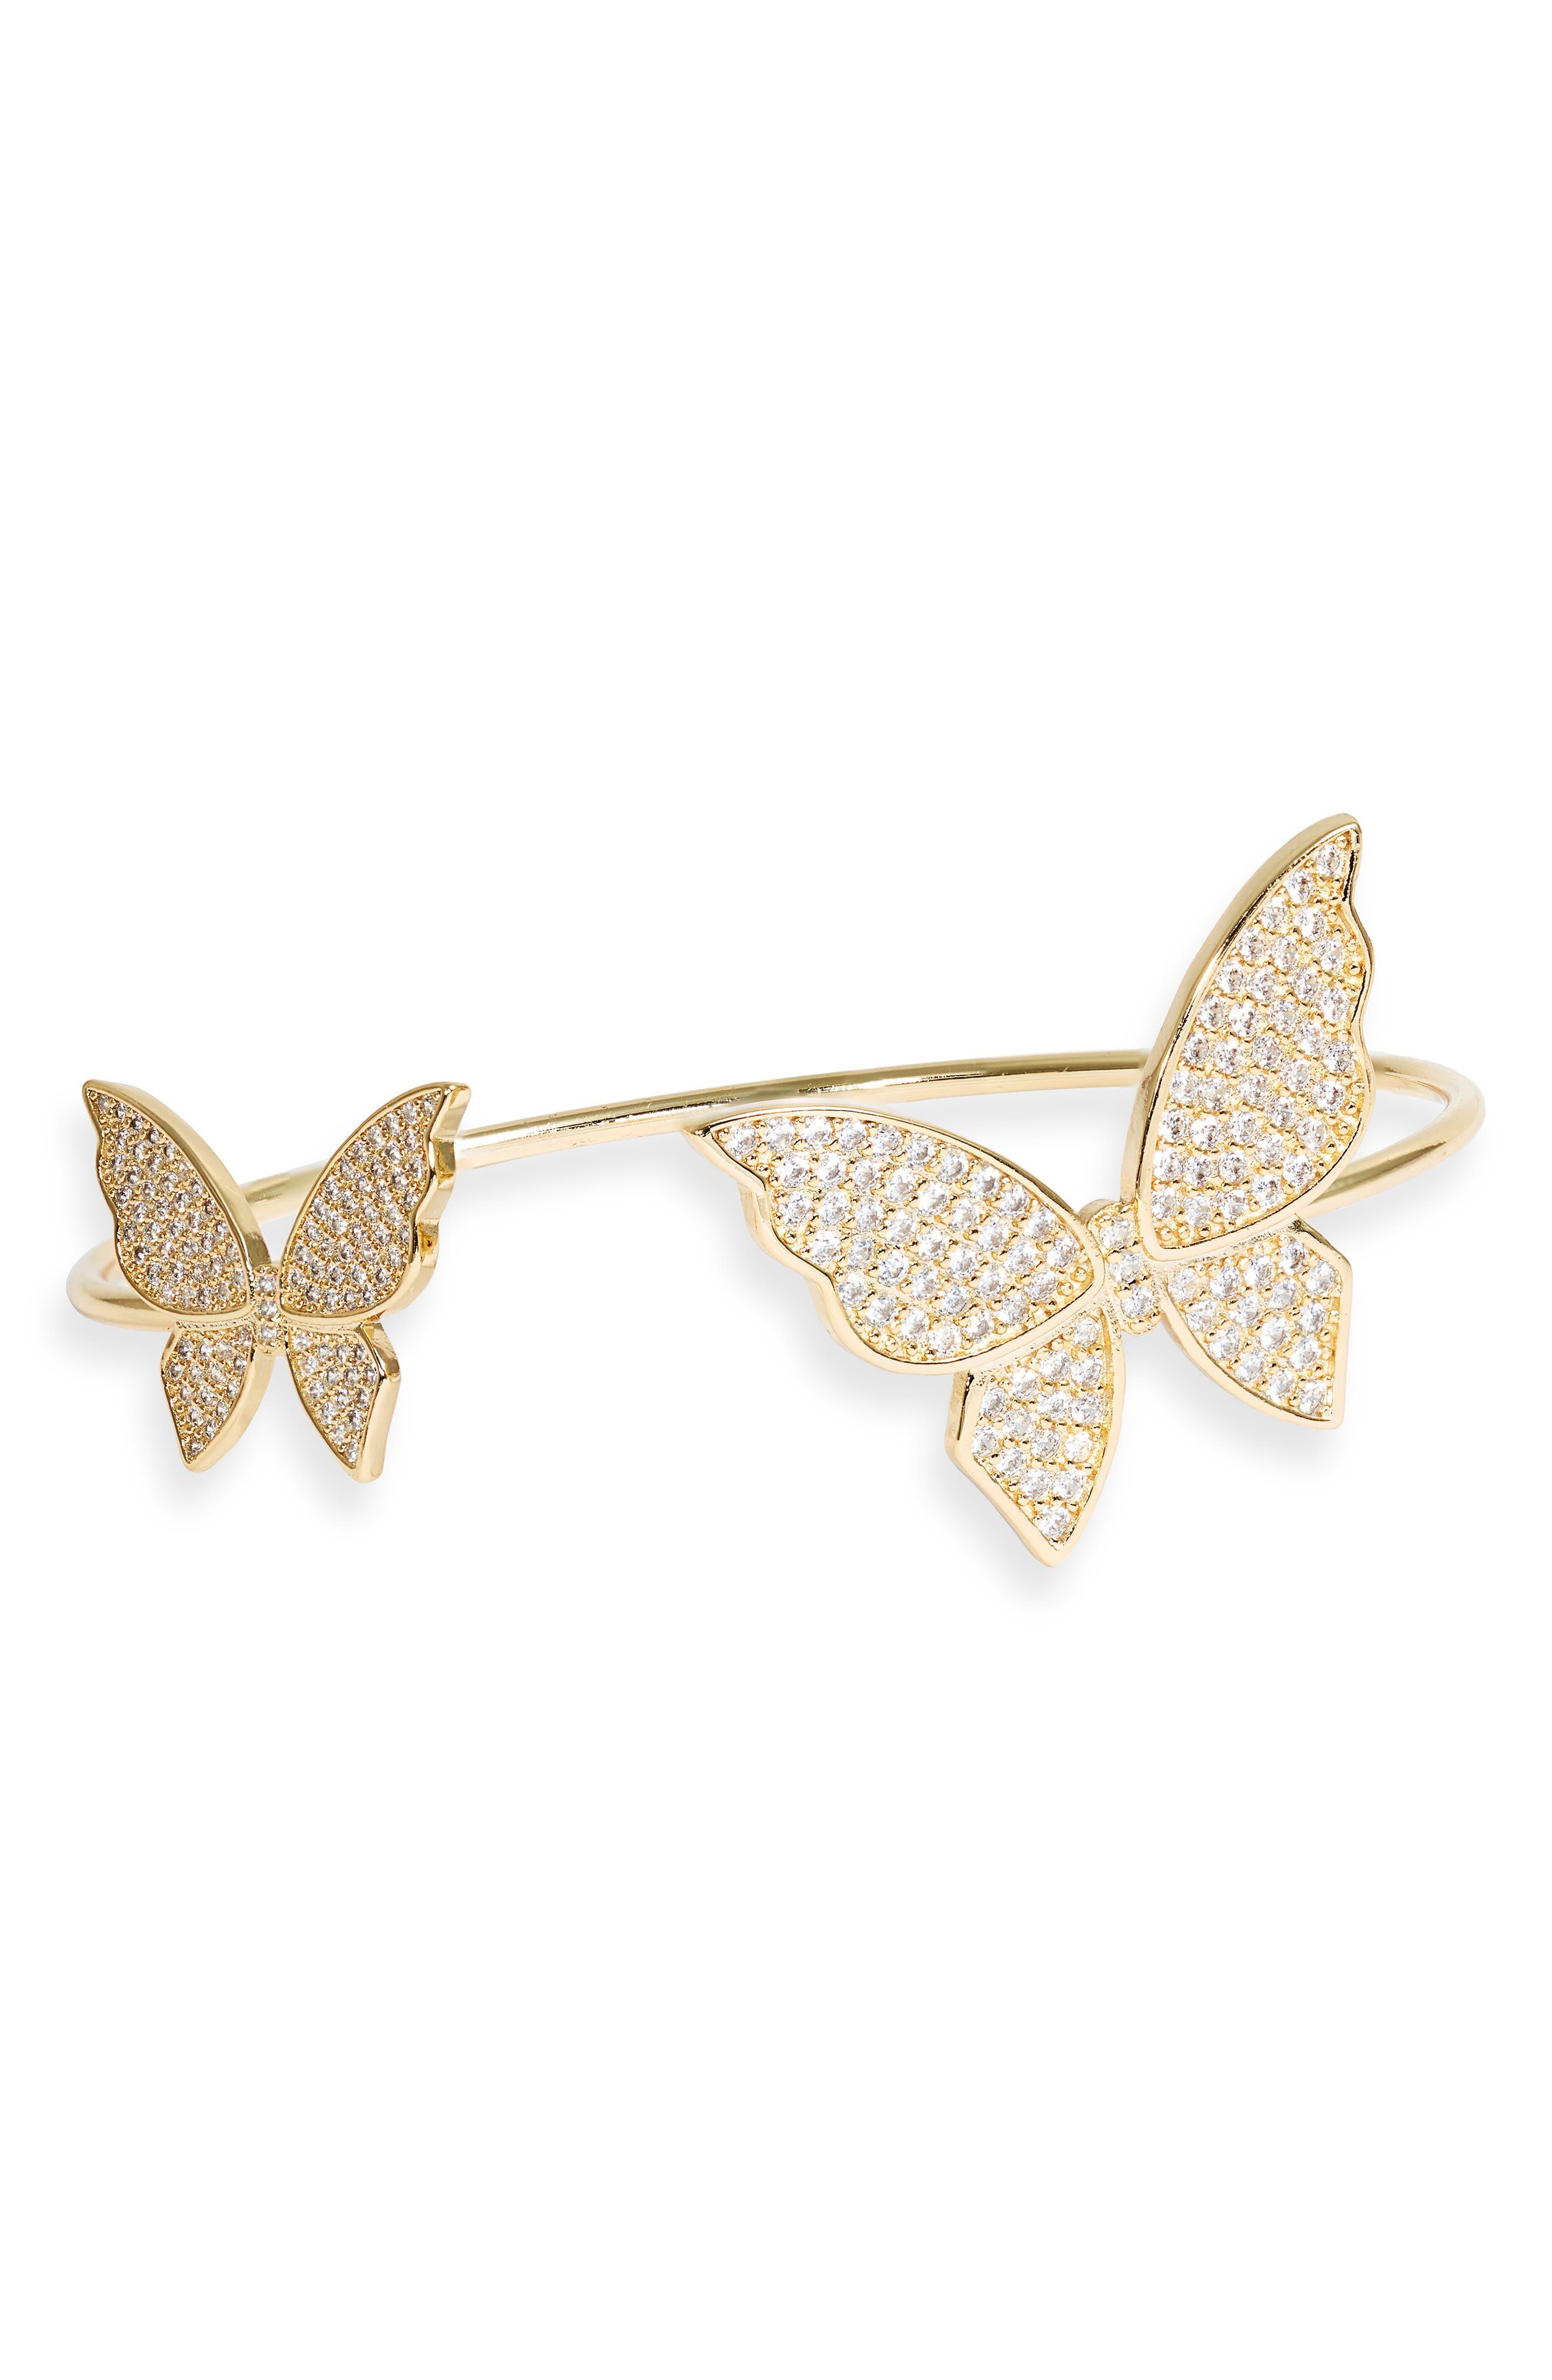 Ana Cubic Zirconia Butterfly Cuff Bracelet